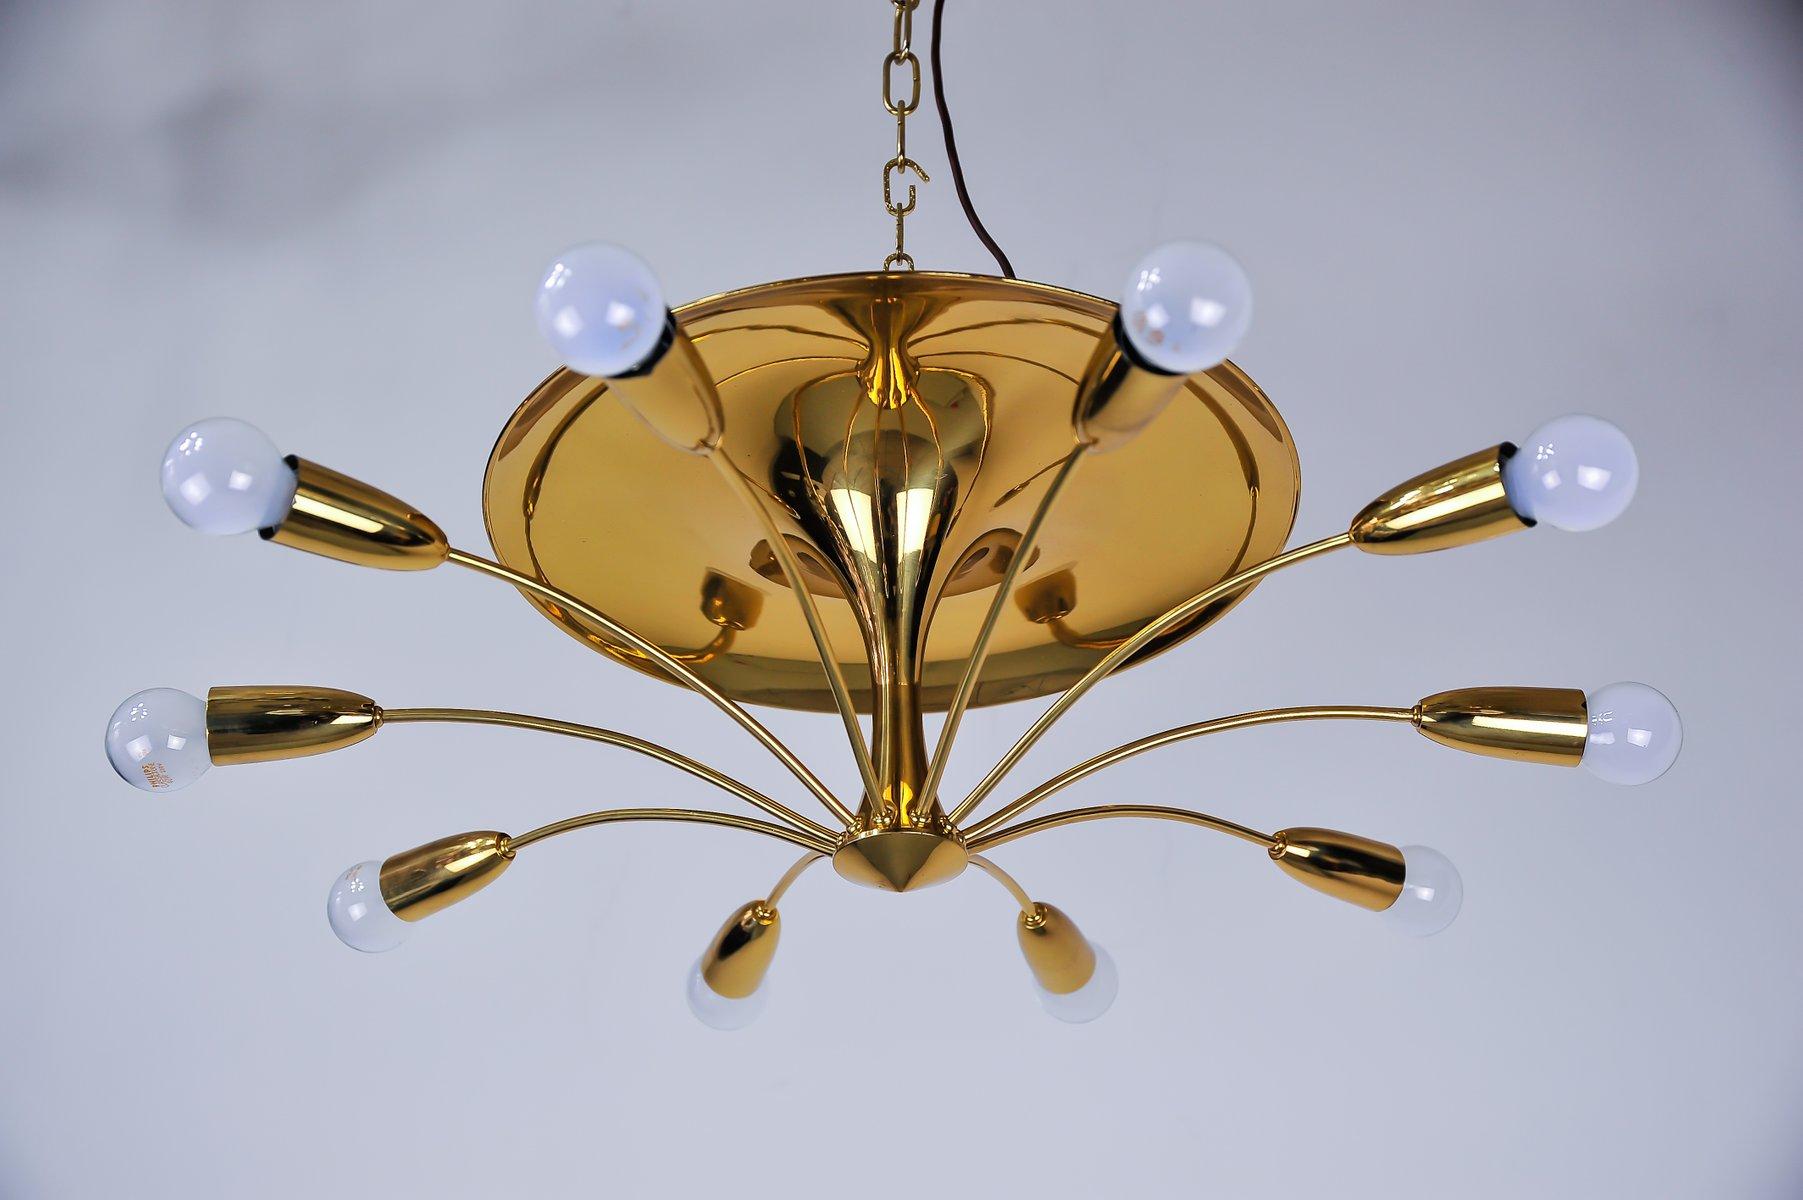 Sputnik Ceiling Lamp by Rupert Nikoll, 1950s